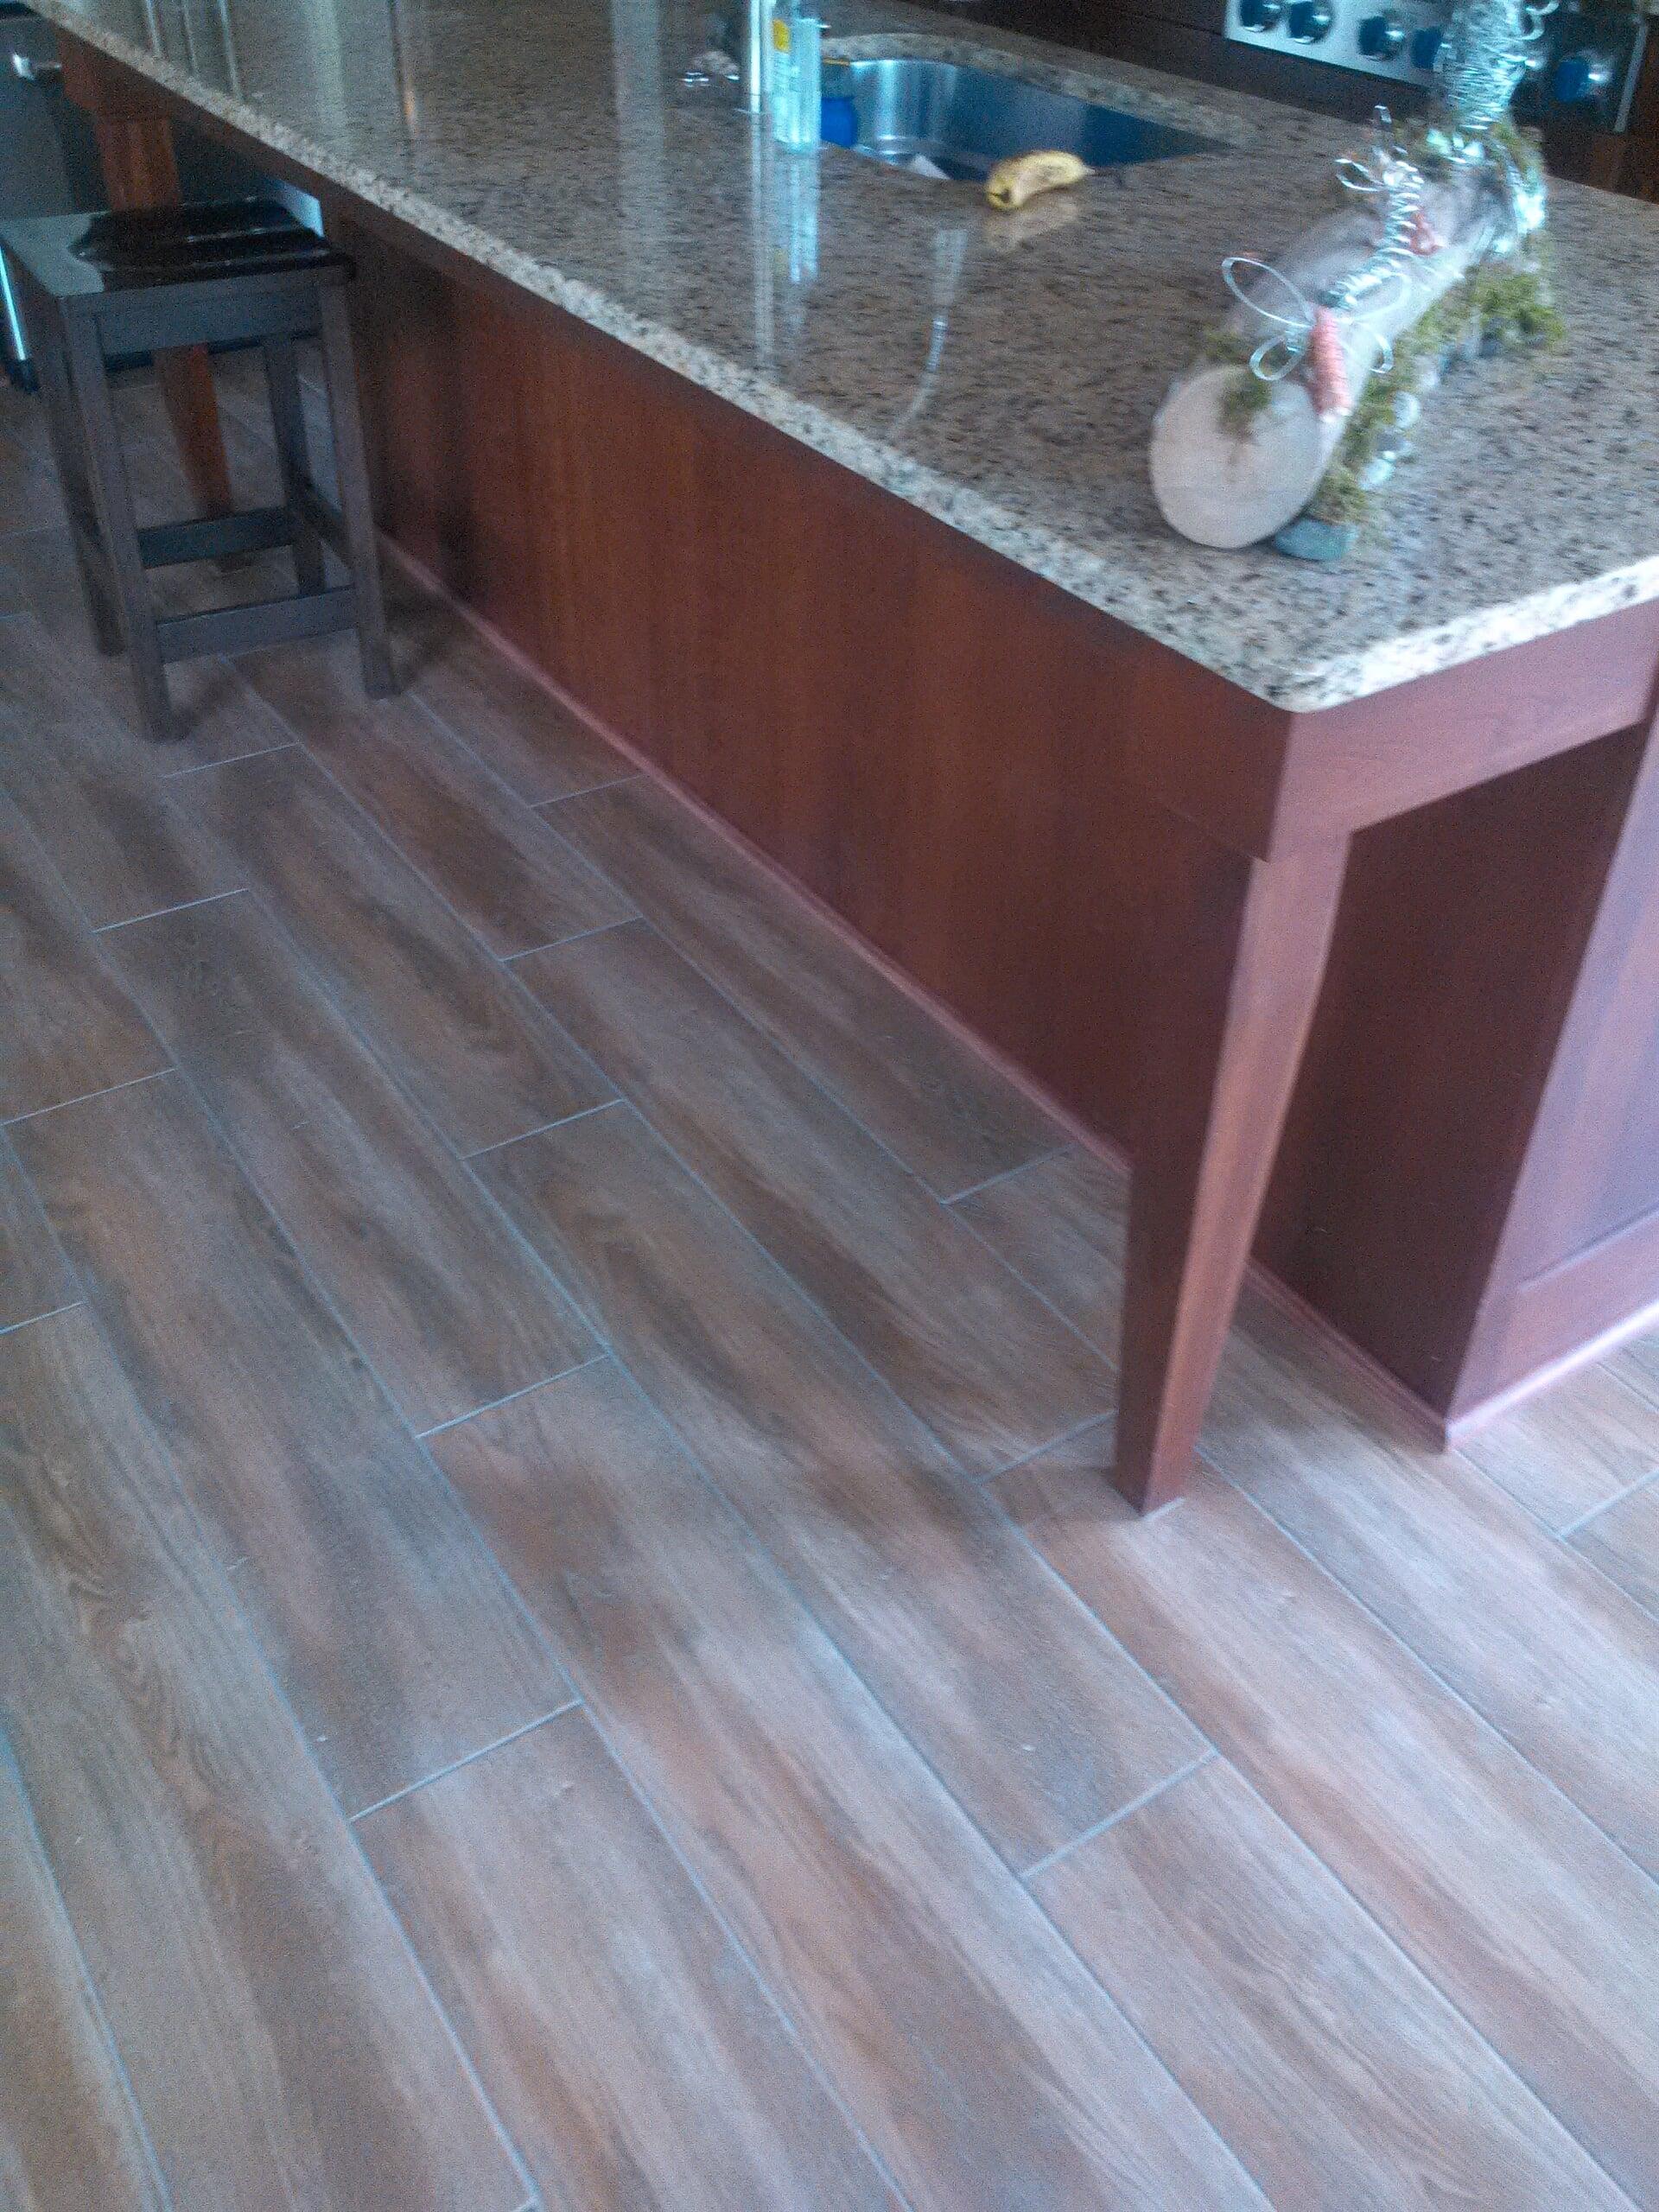 Vinyl plank flooring from Floorcrafters - Moline in Davenport, IA